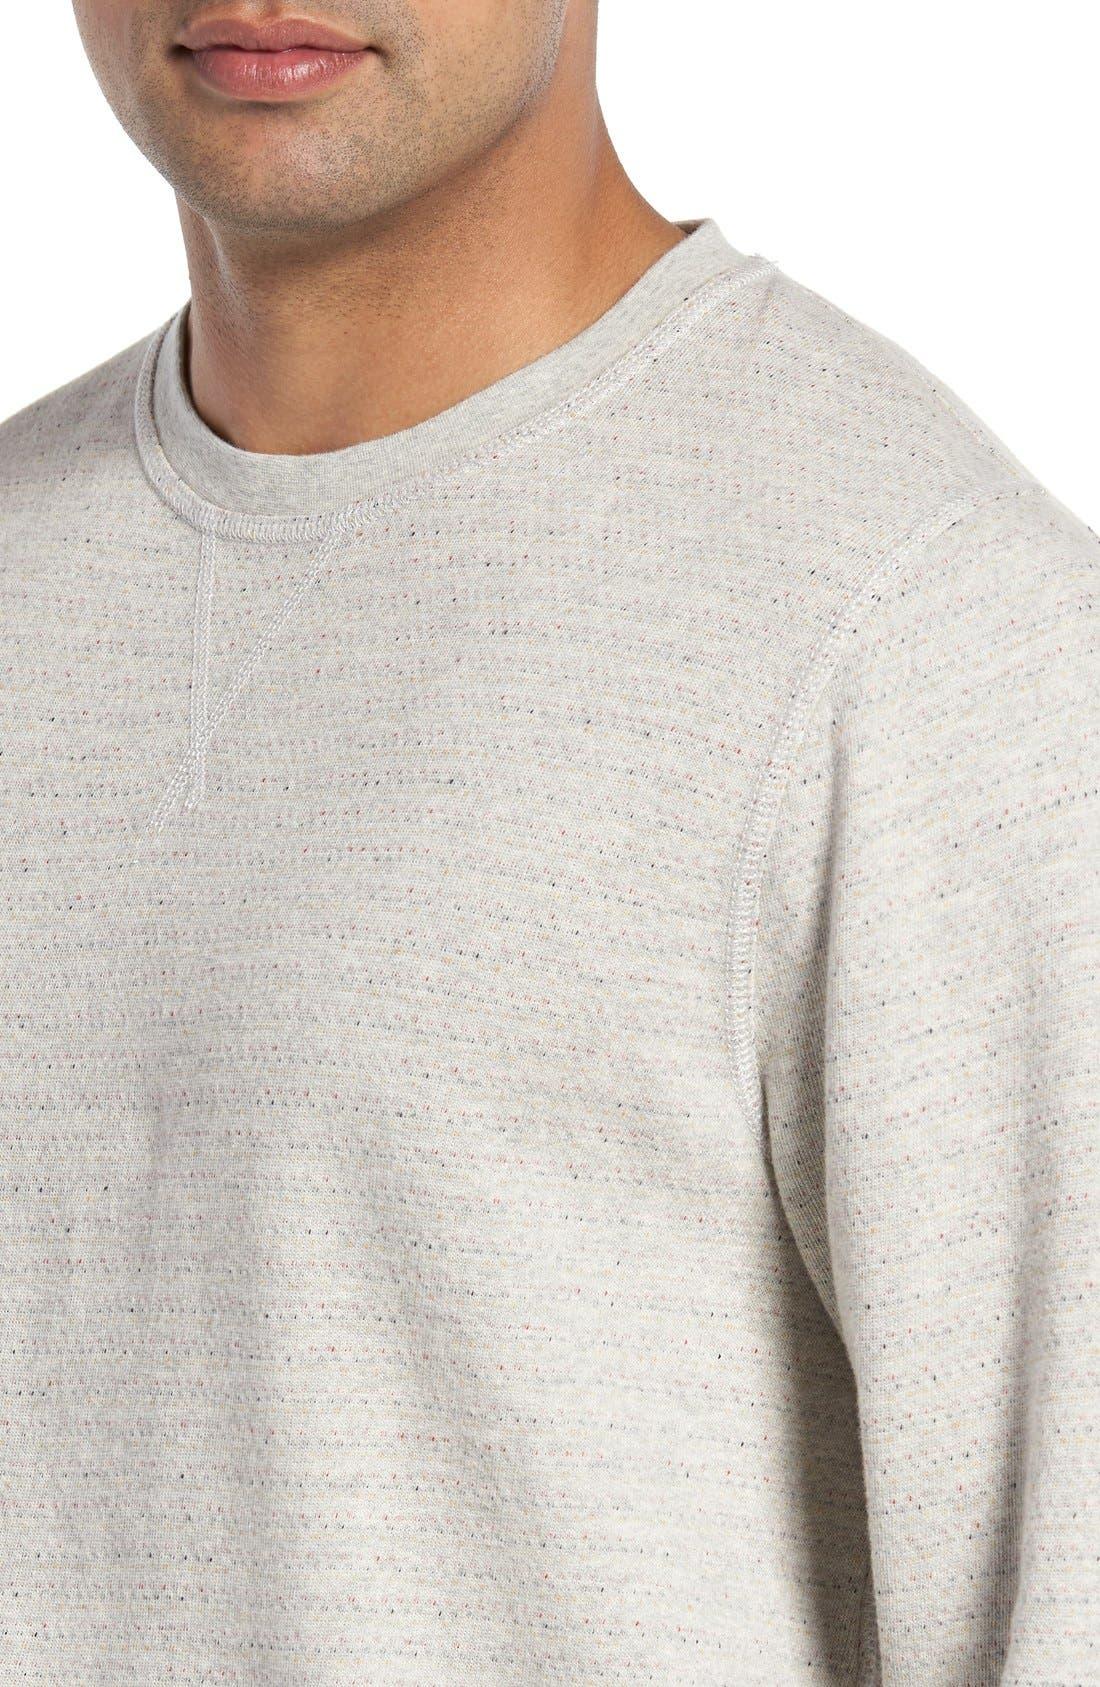 'Gleann' French Terry Crewneck Sweatshirt,                             Alternate thumbnail 5, color,                             250